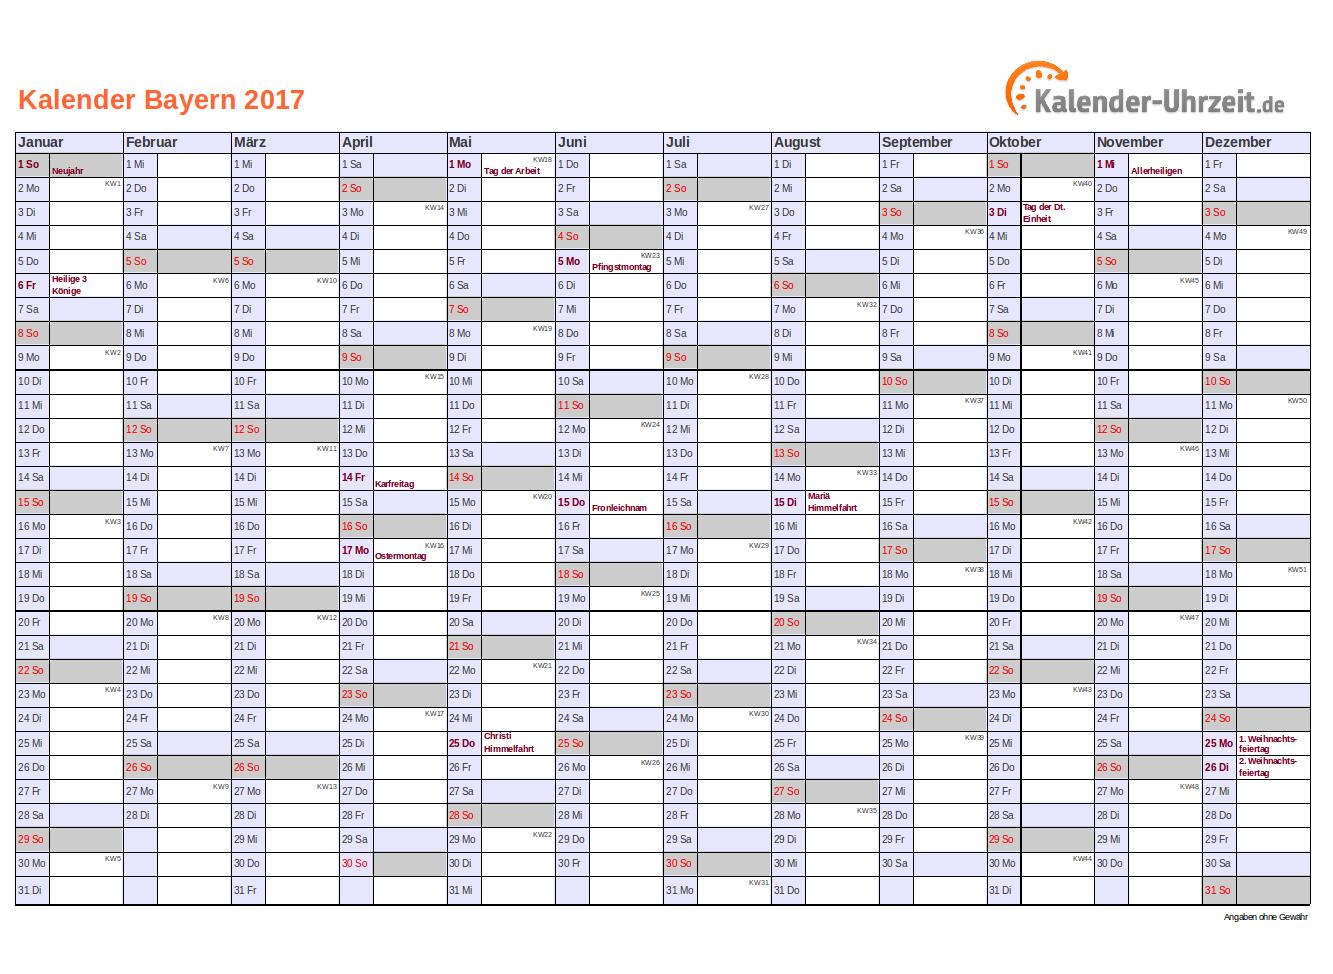 Bayern Kalender 2017 mit